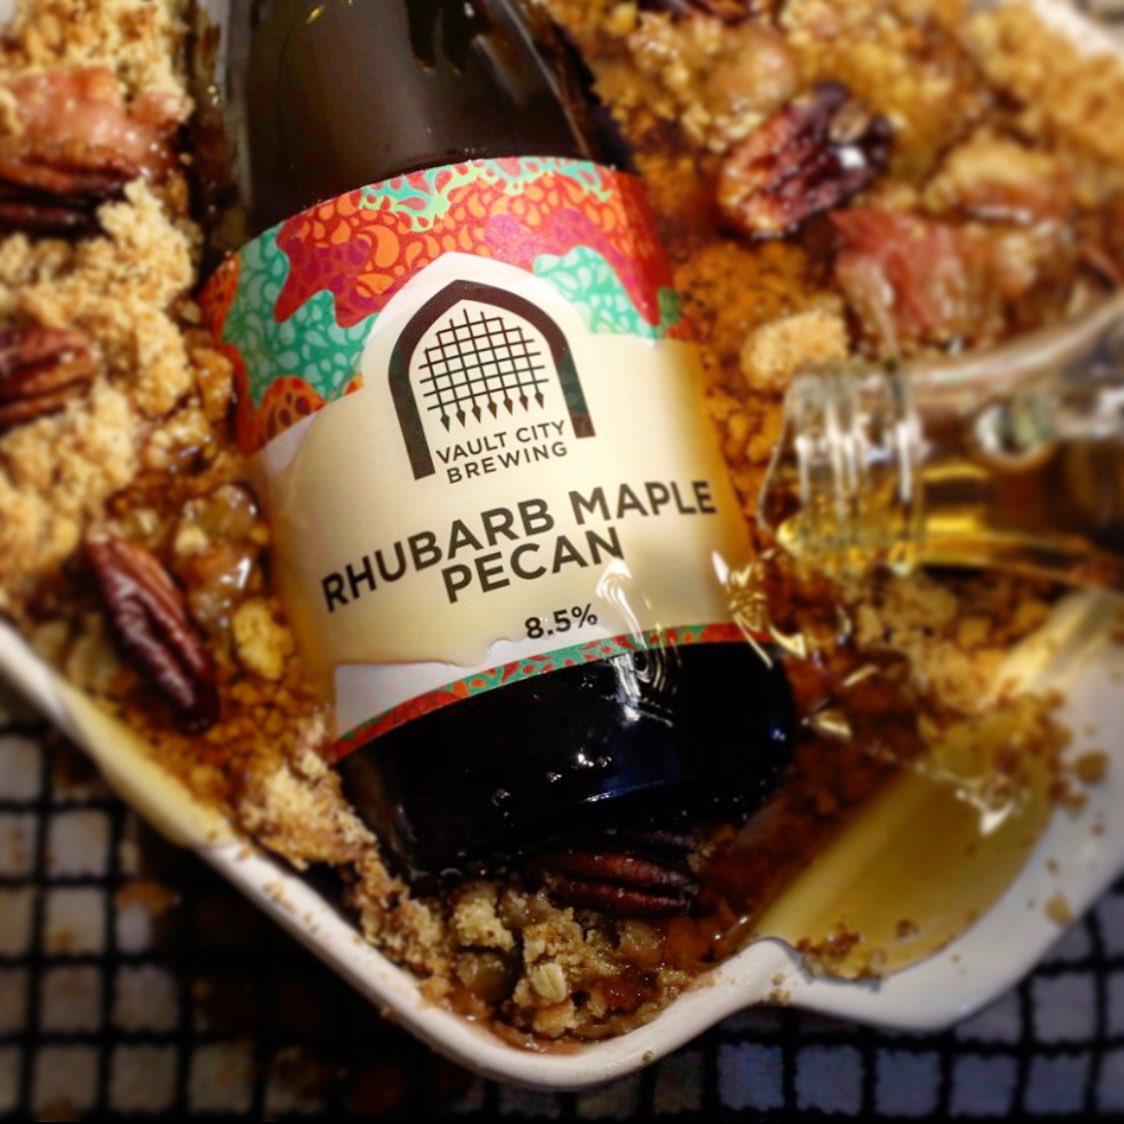 Vault City | Rhubarb Maple Pecan | Fruited Sour 8.5% 375ml